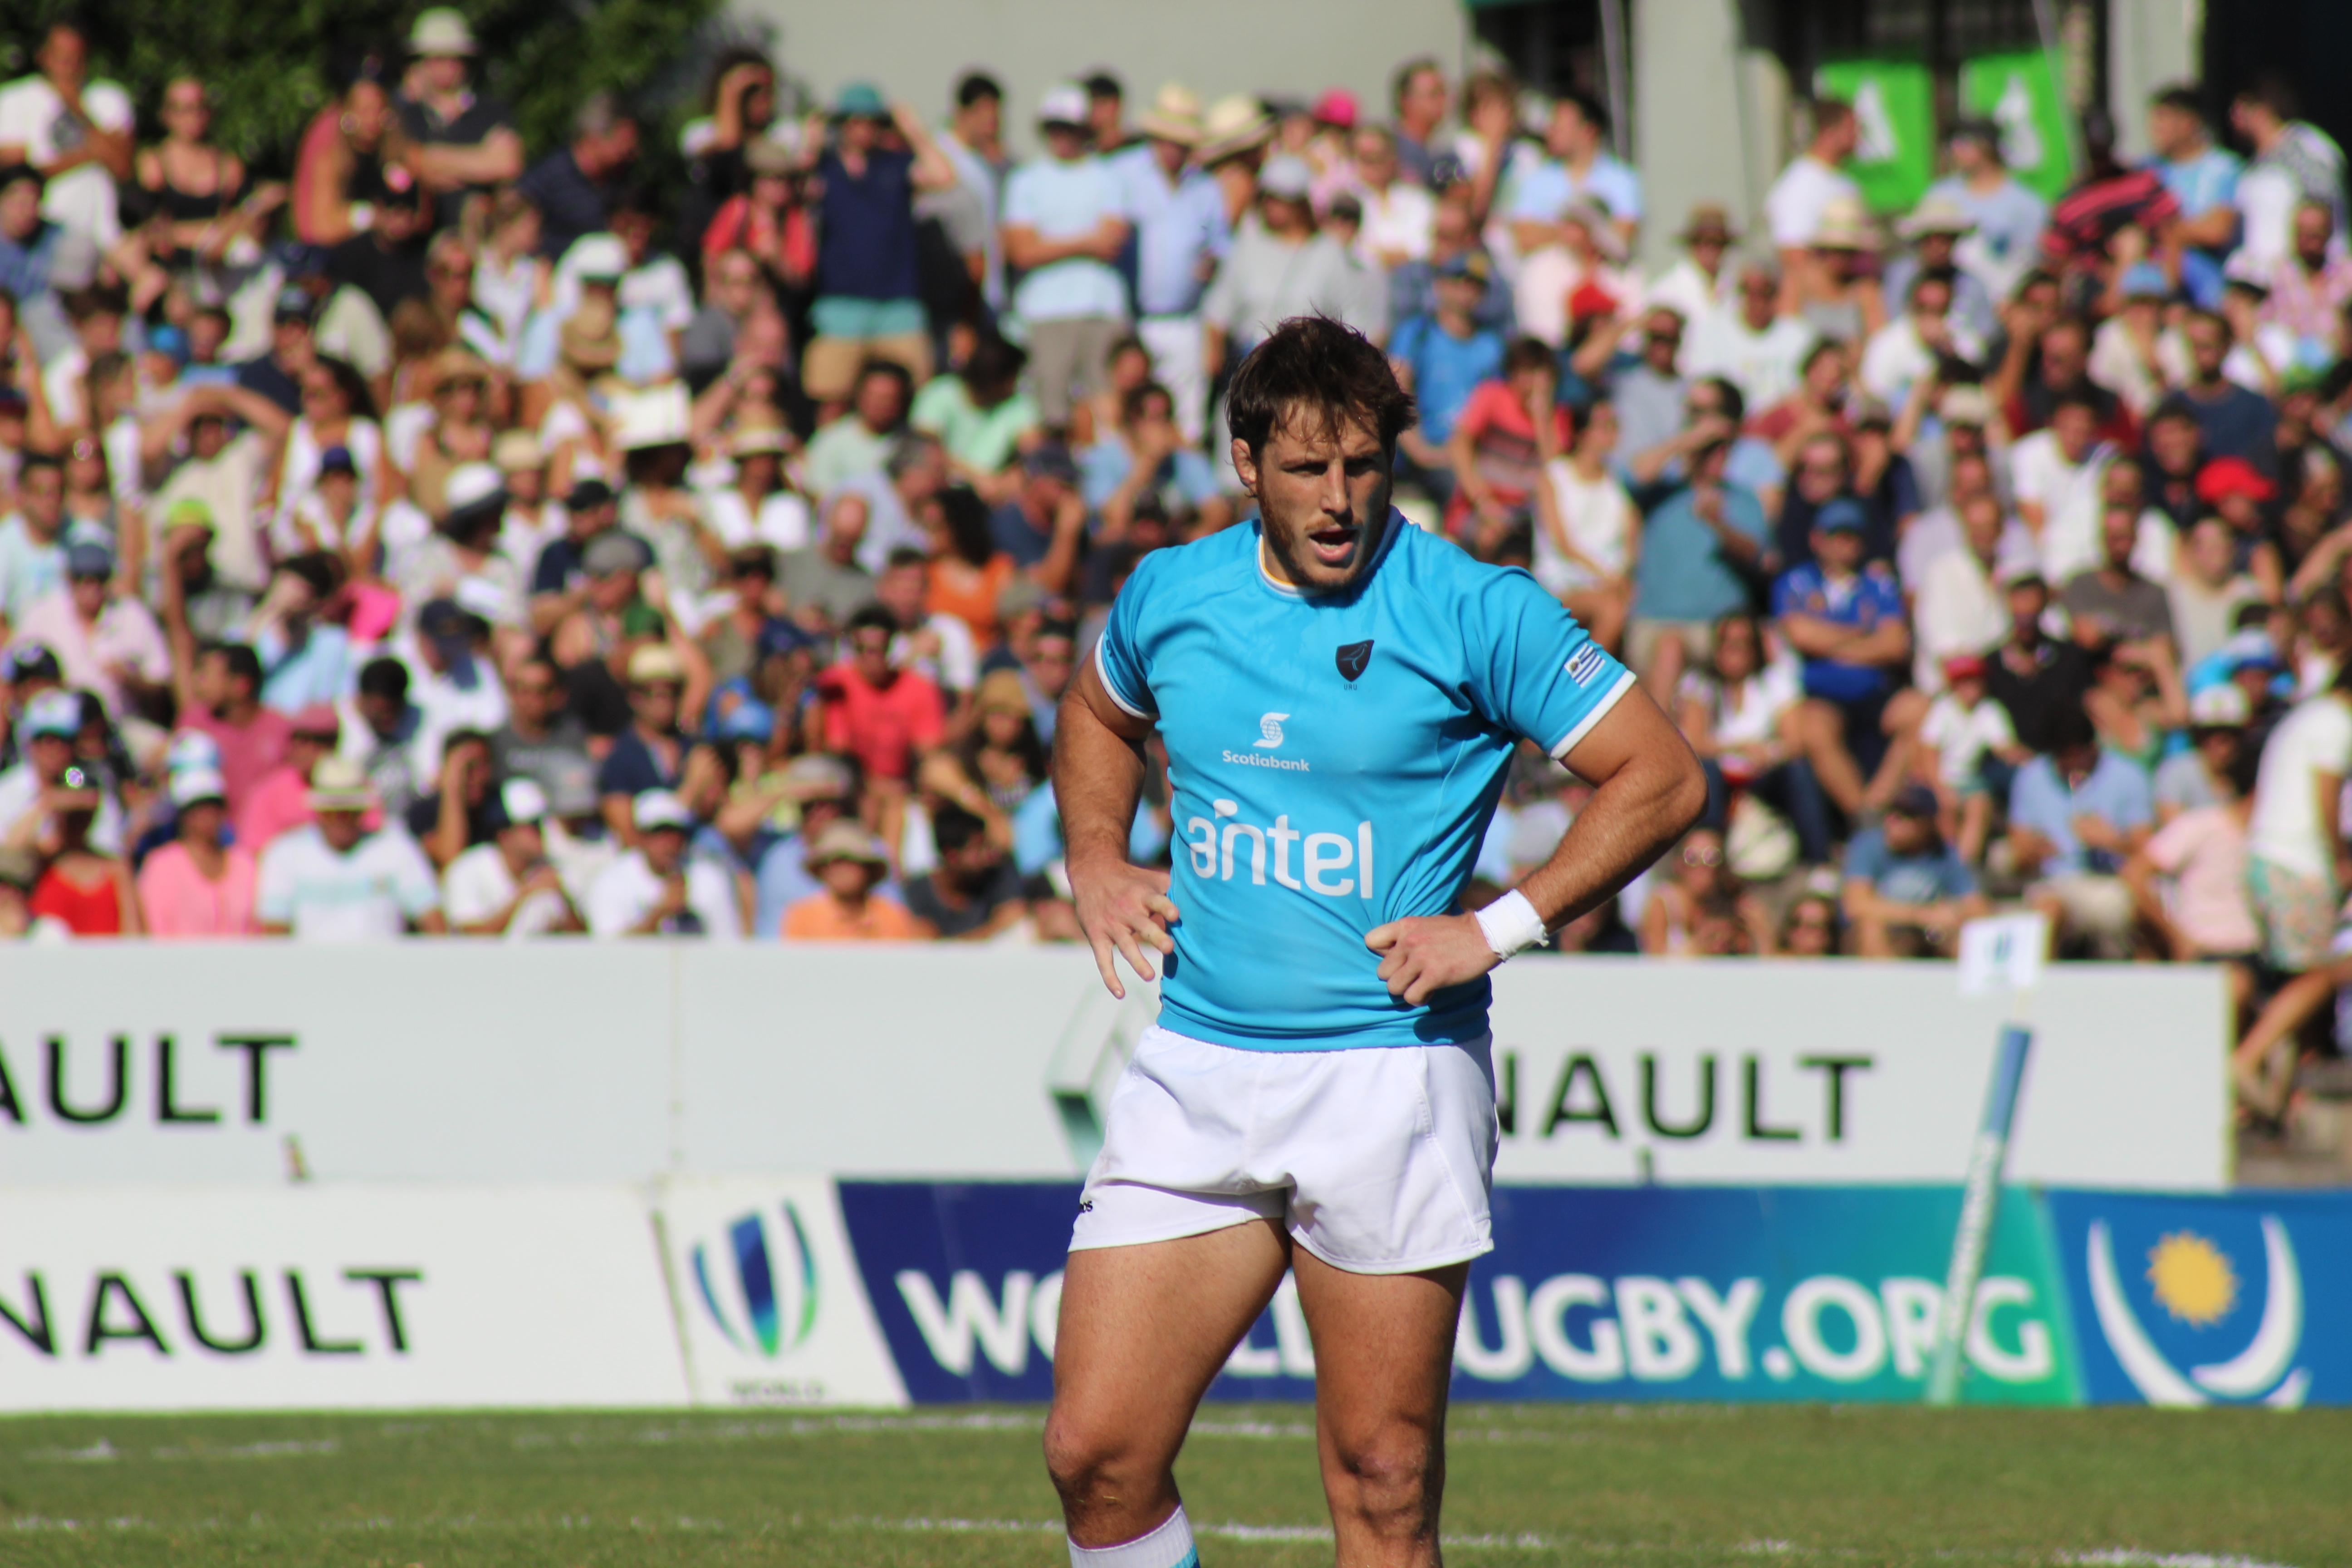 Uruguay lleva 13 Test Matches ganados de forma consecutiva